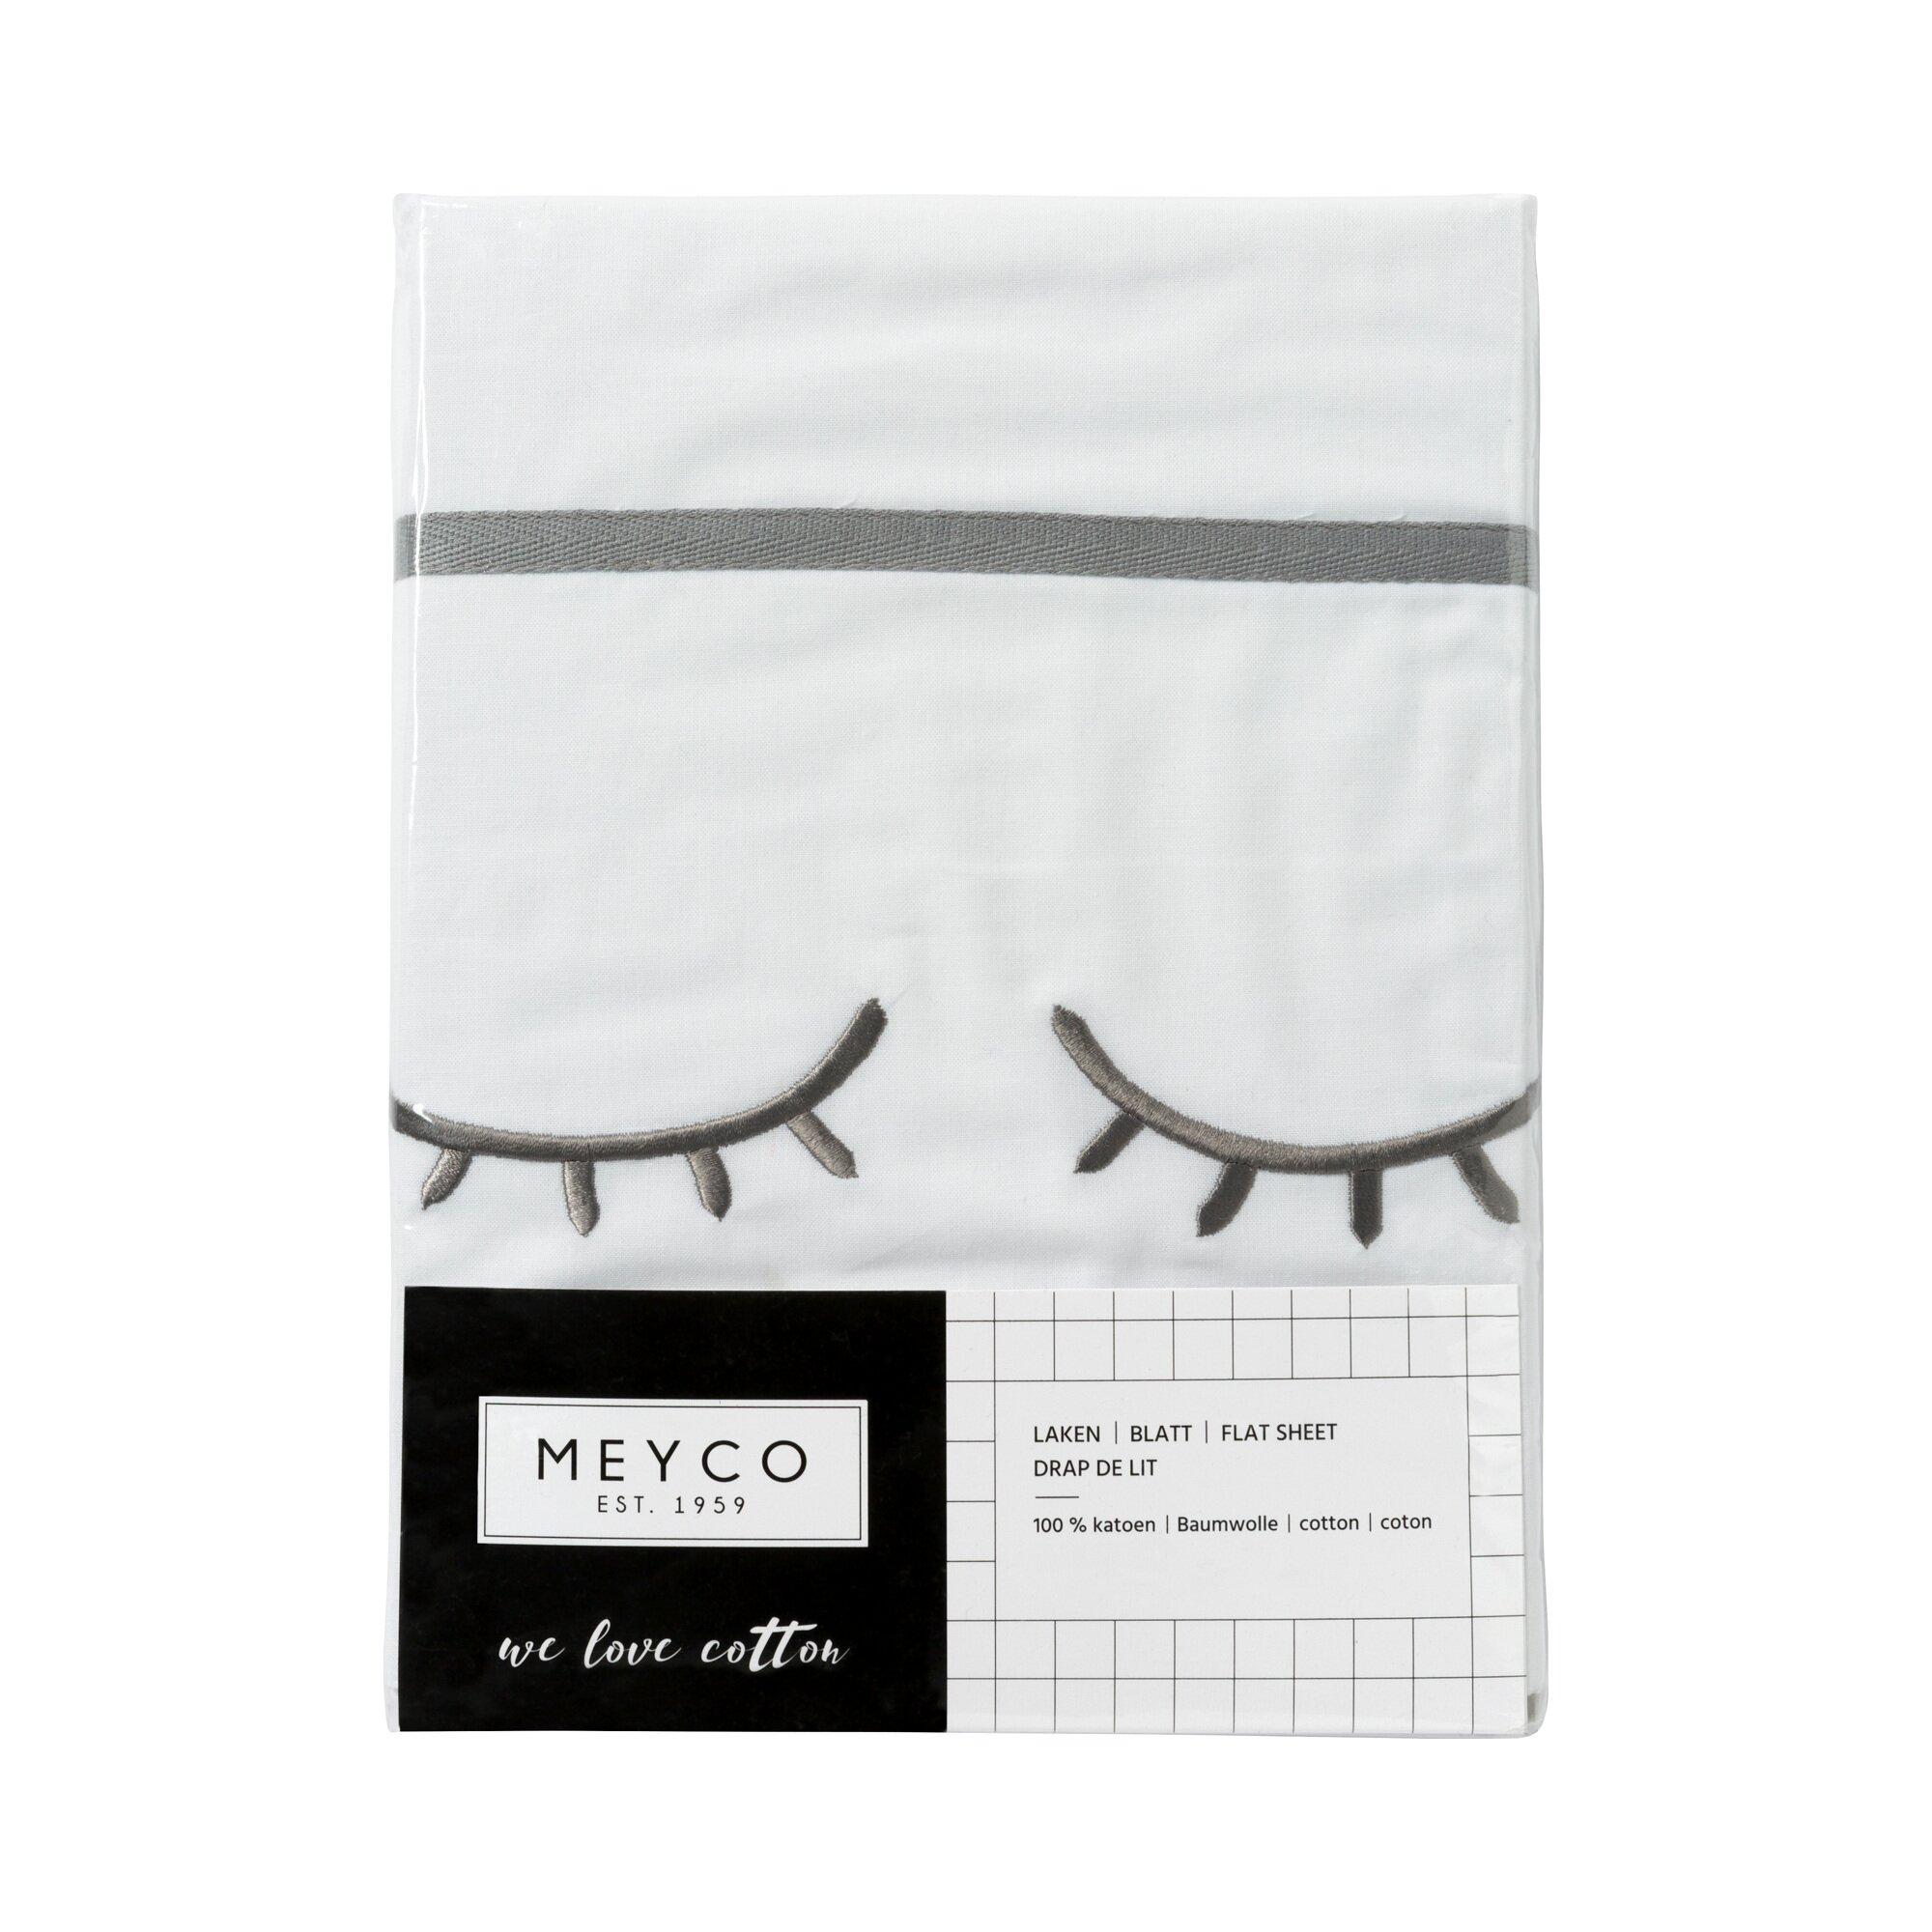 Meyco Bettlaken Design 75x100 cm